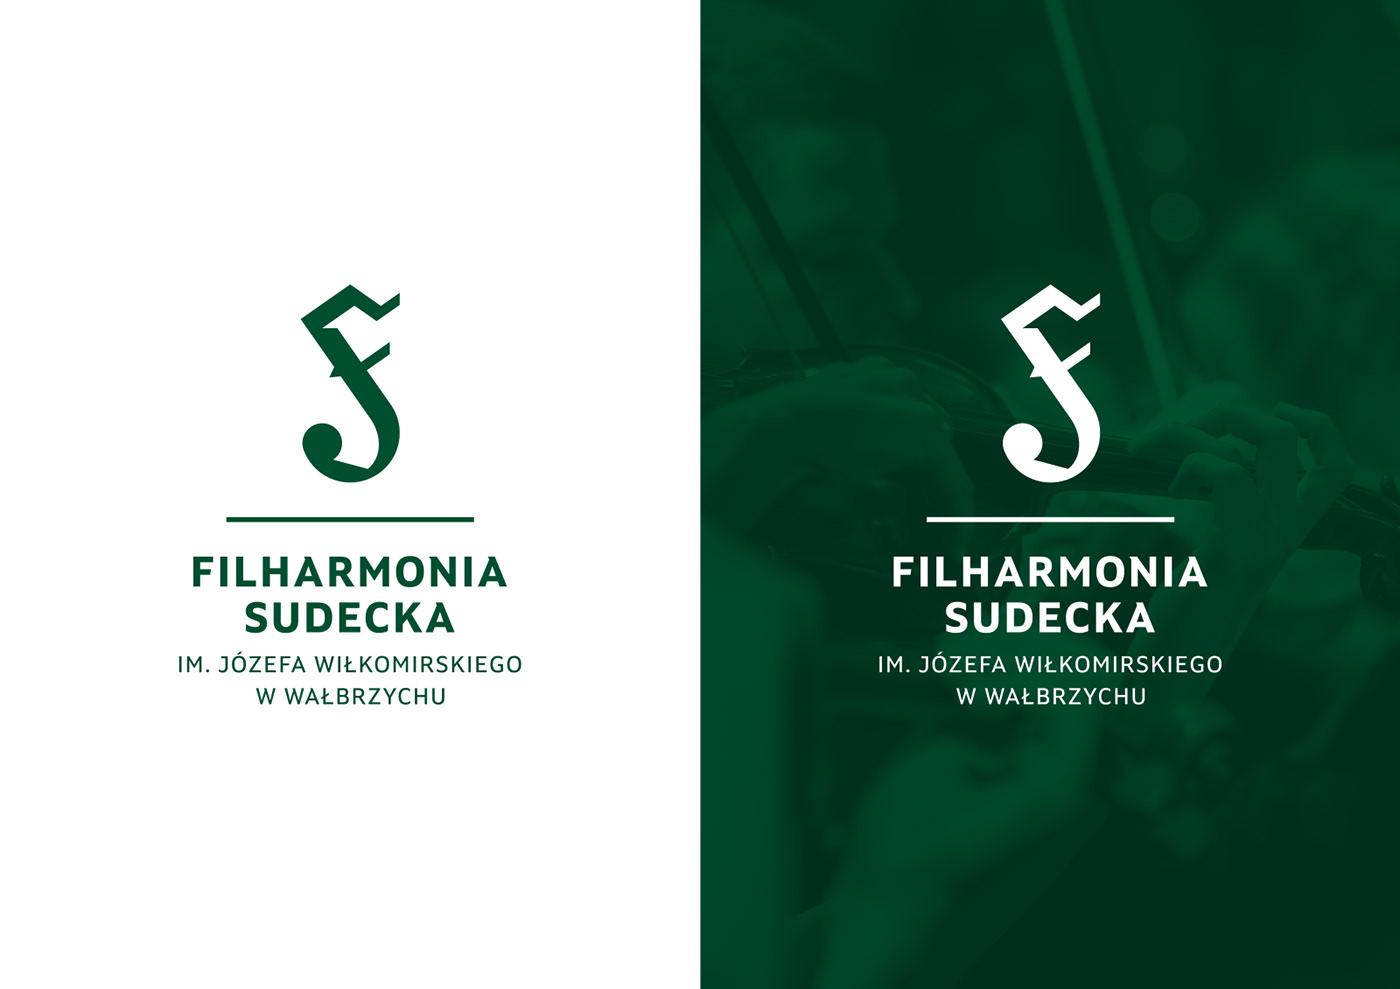 filharmonia identity identyfikacja wizualna instrument logo Logo Design monogram orchestra philharmonic symbol